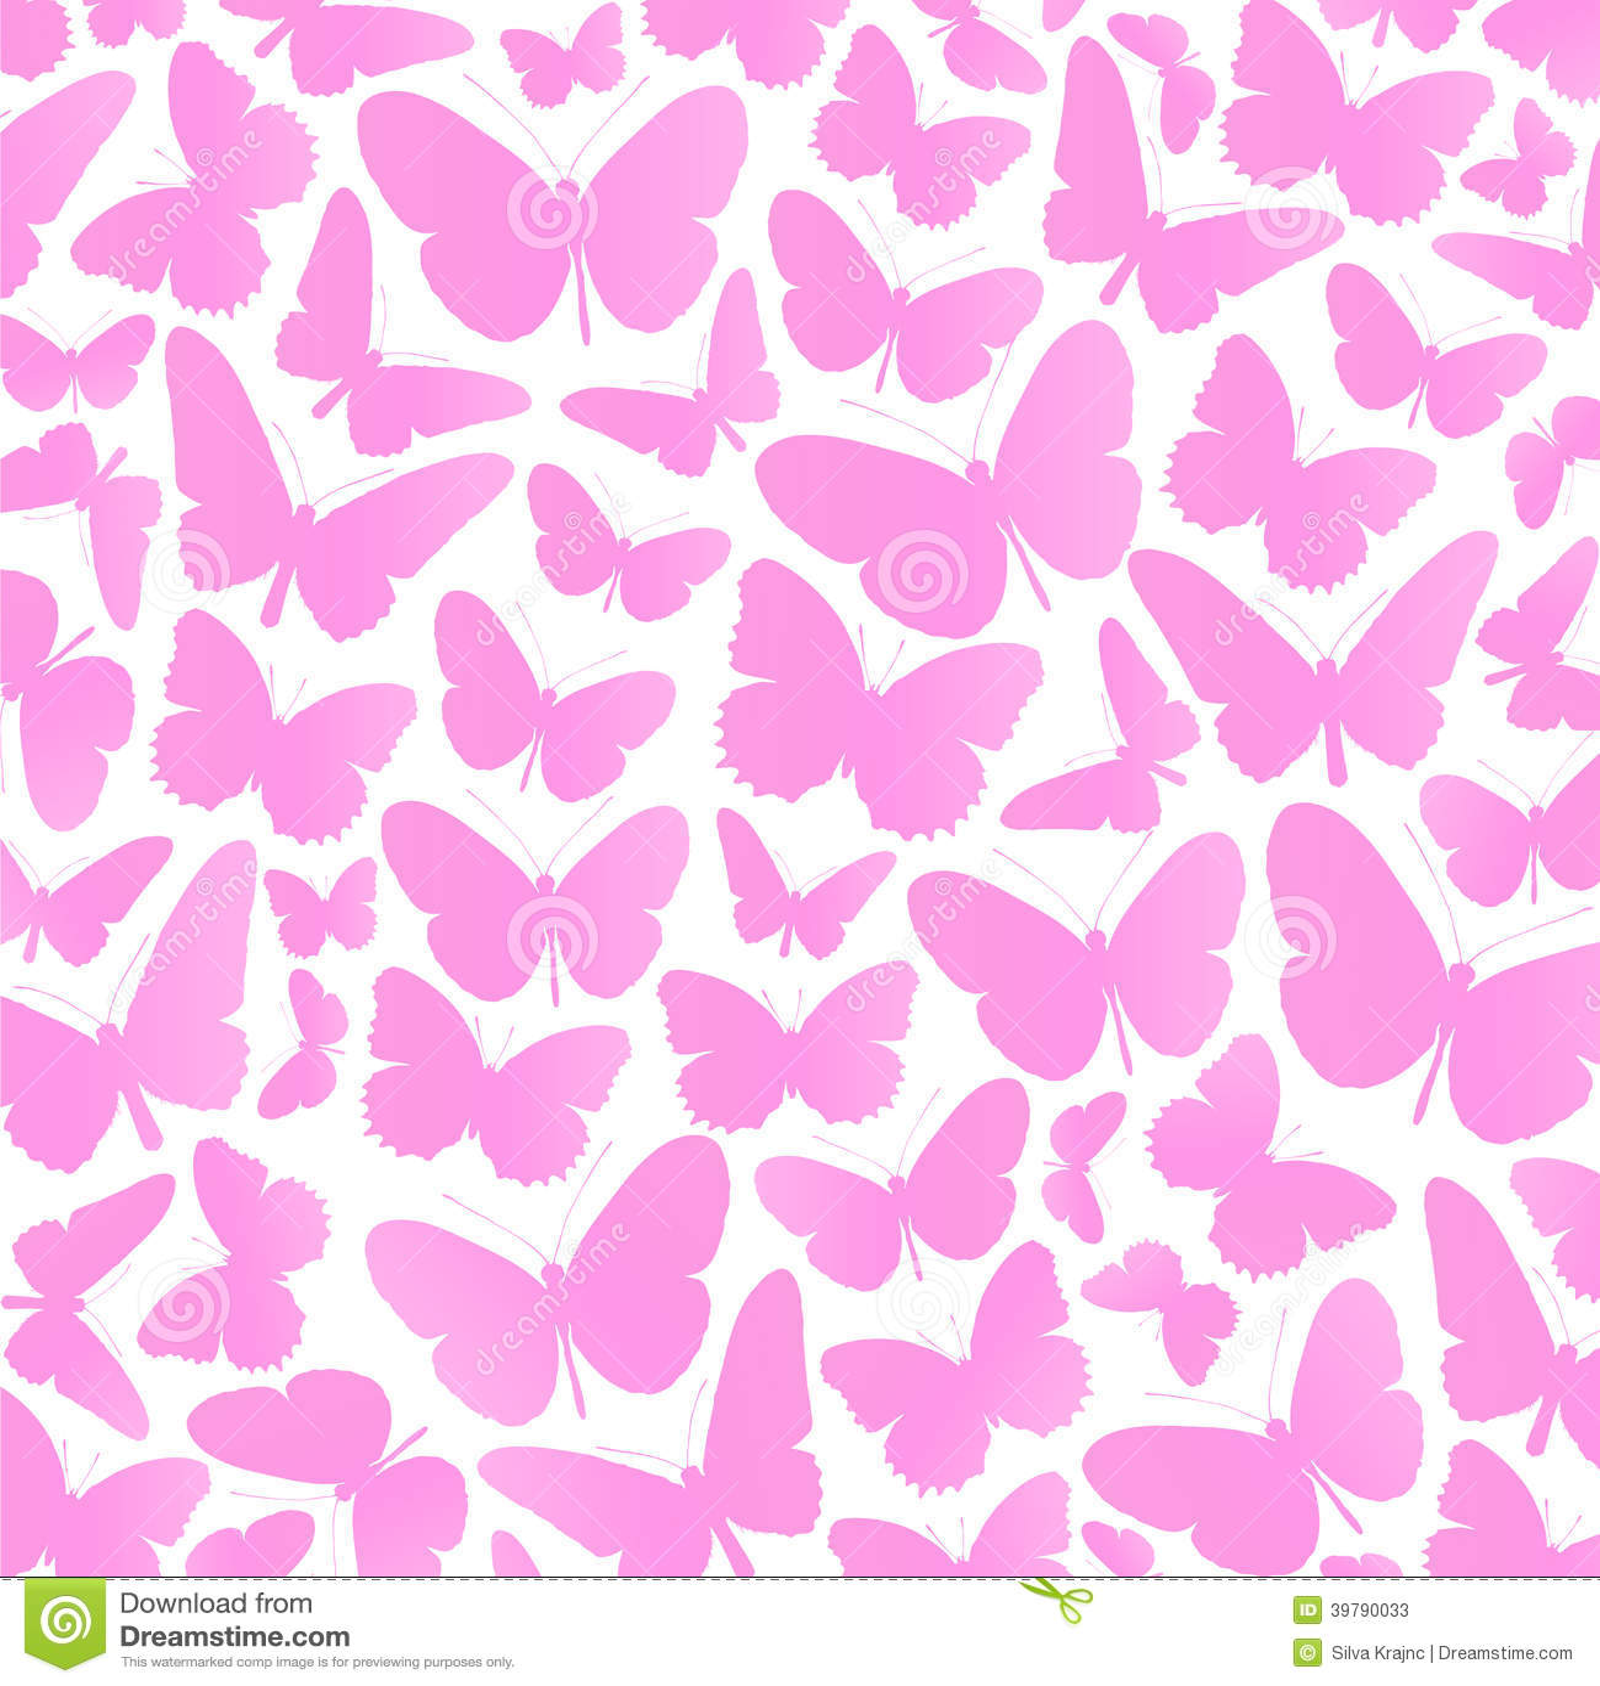 Pink Butterfly Wallpaper: Pink Butterflies Background Vector Stock Vector